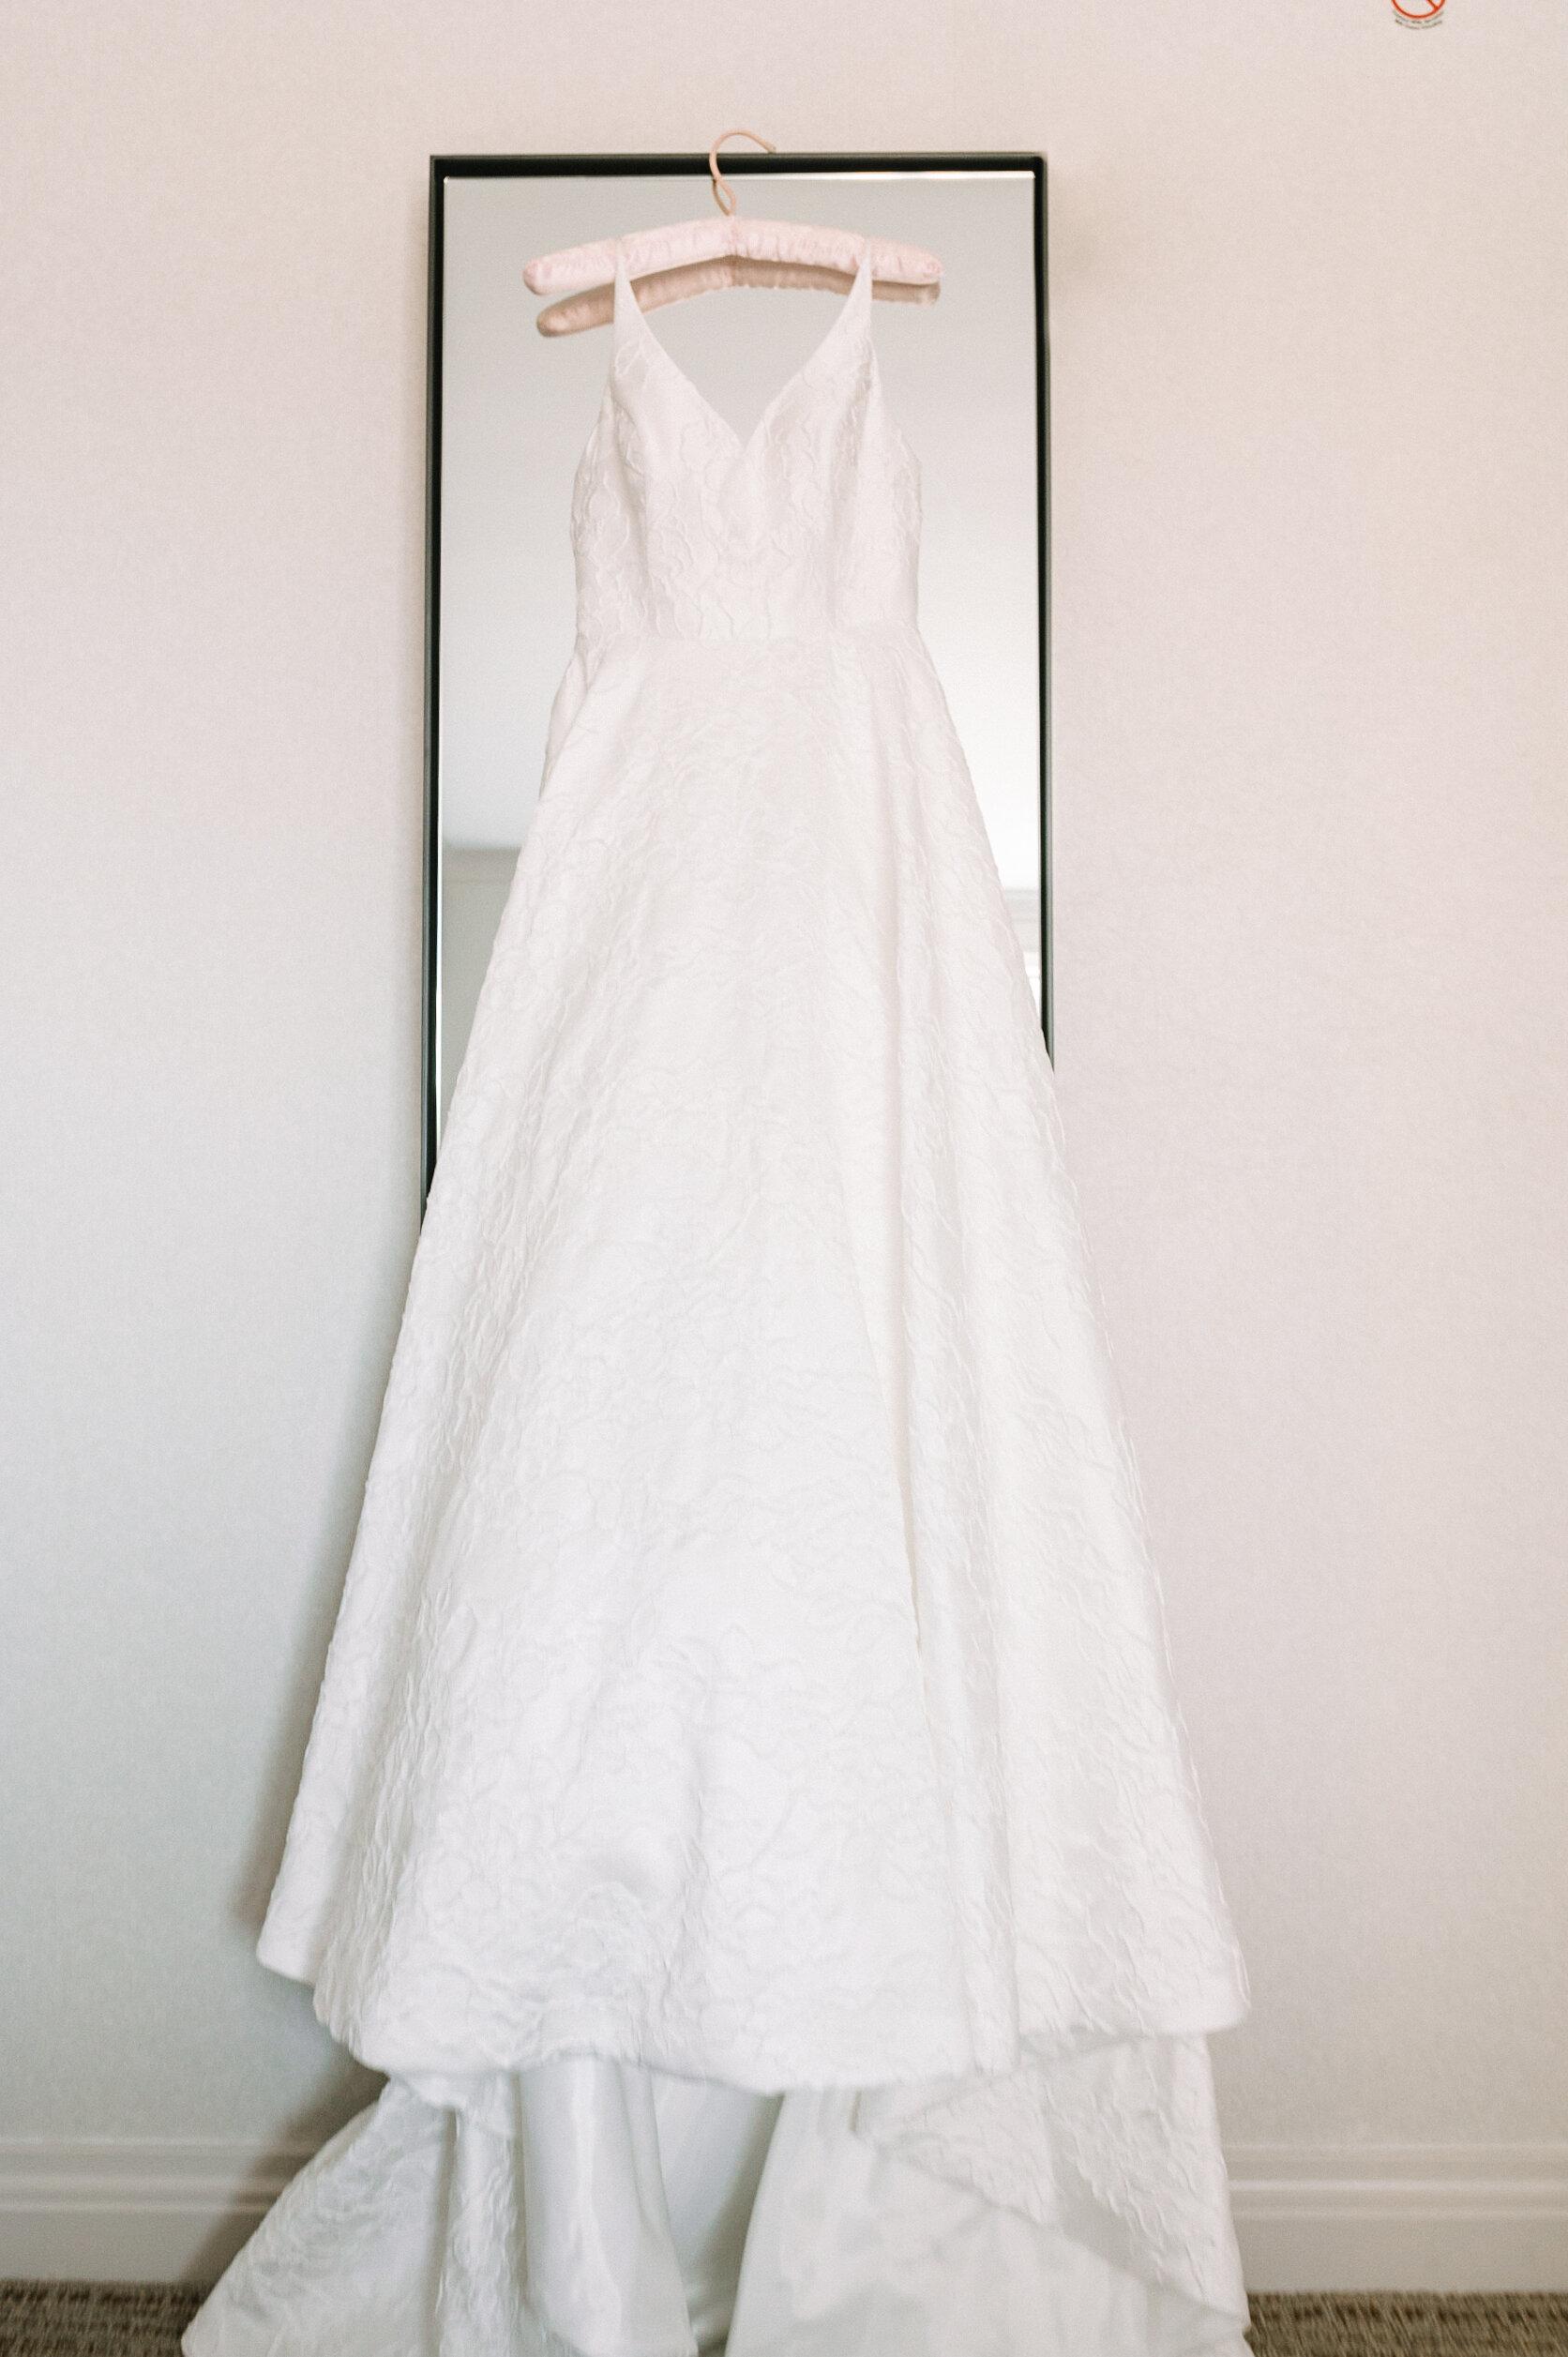 Detail shot of wedding dress at The Winslow